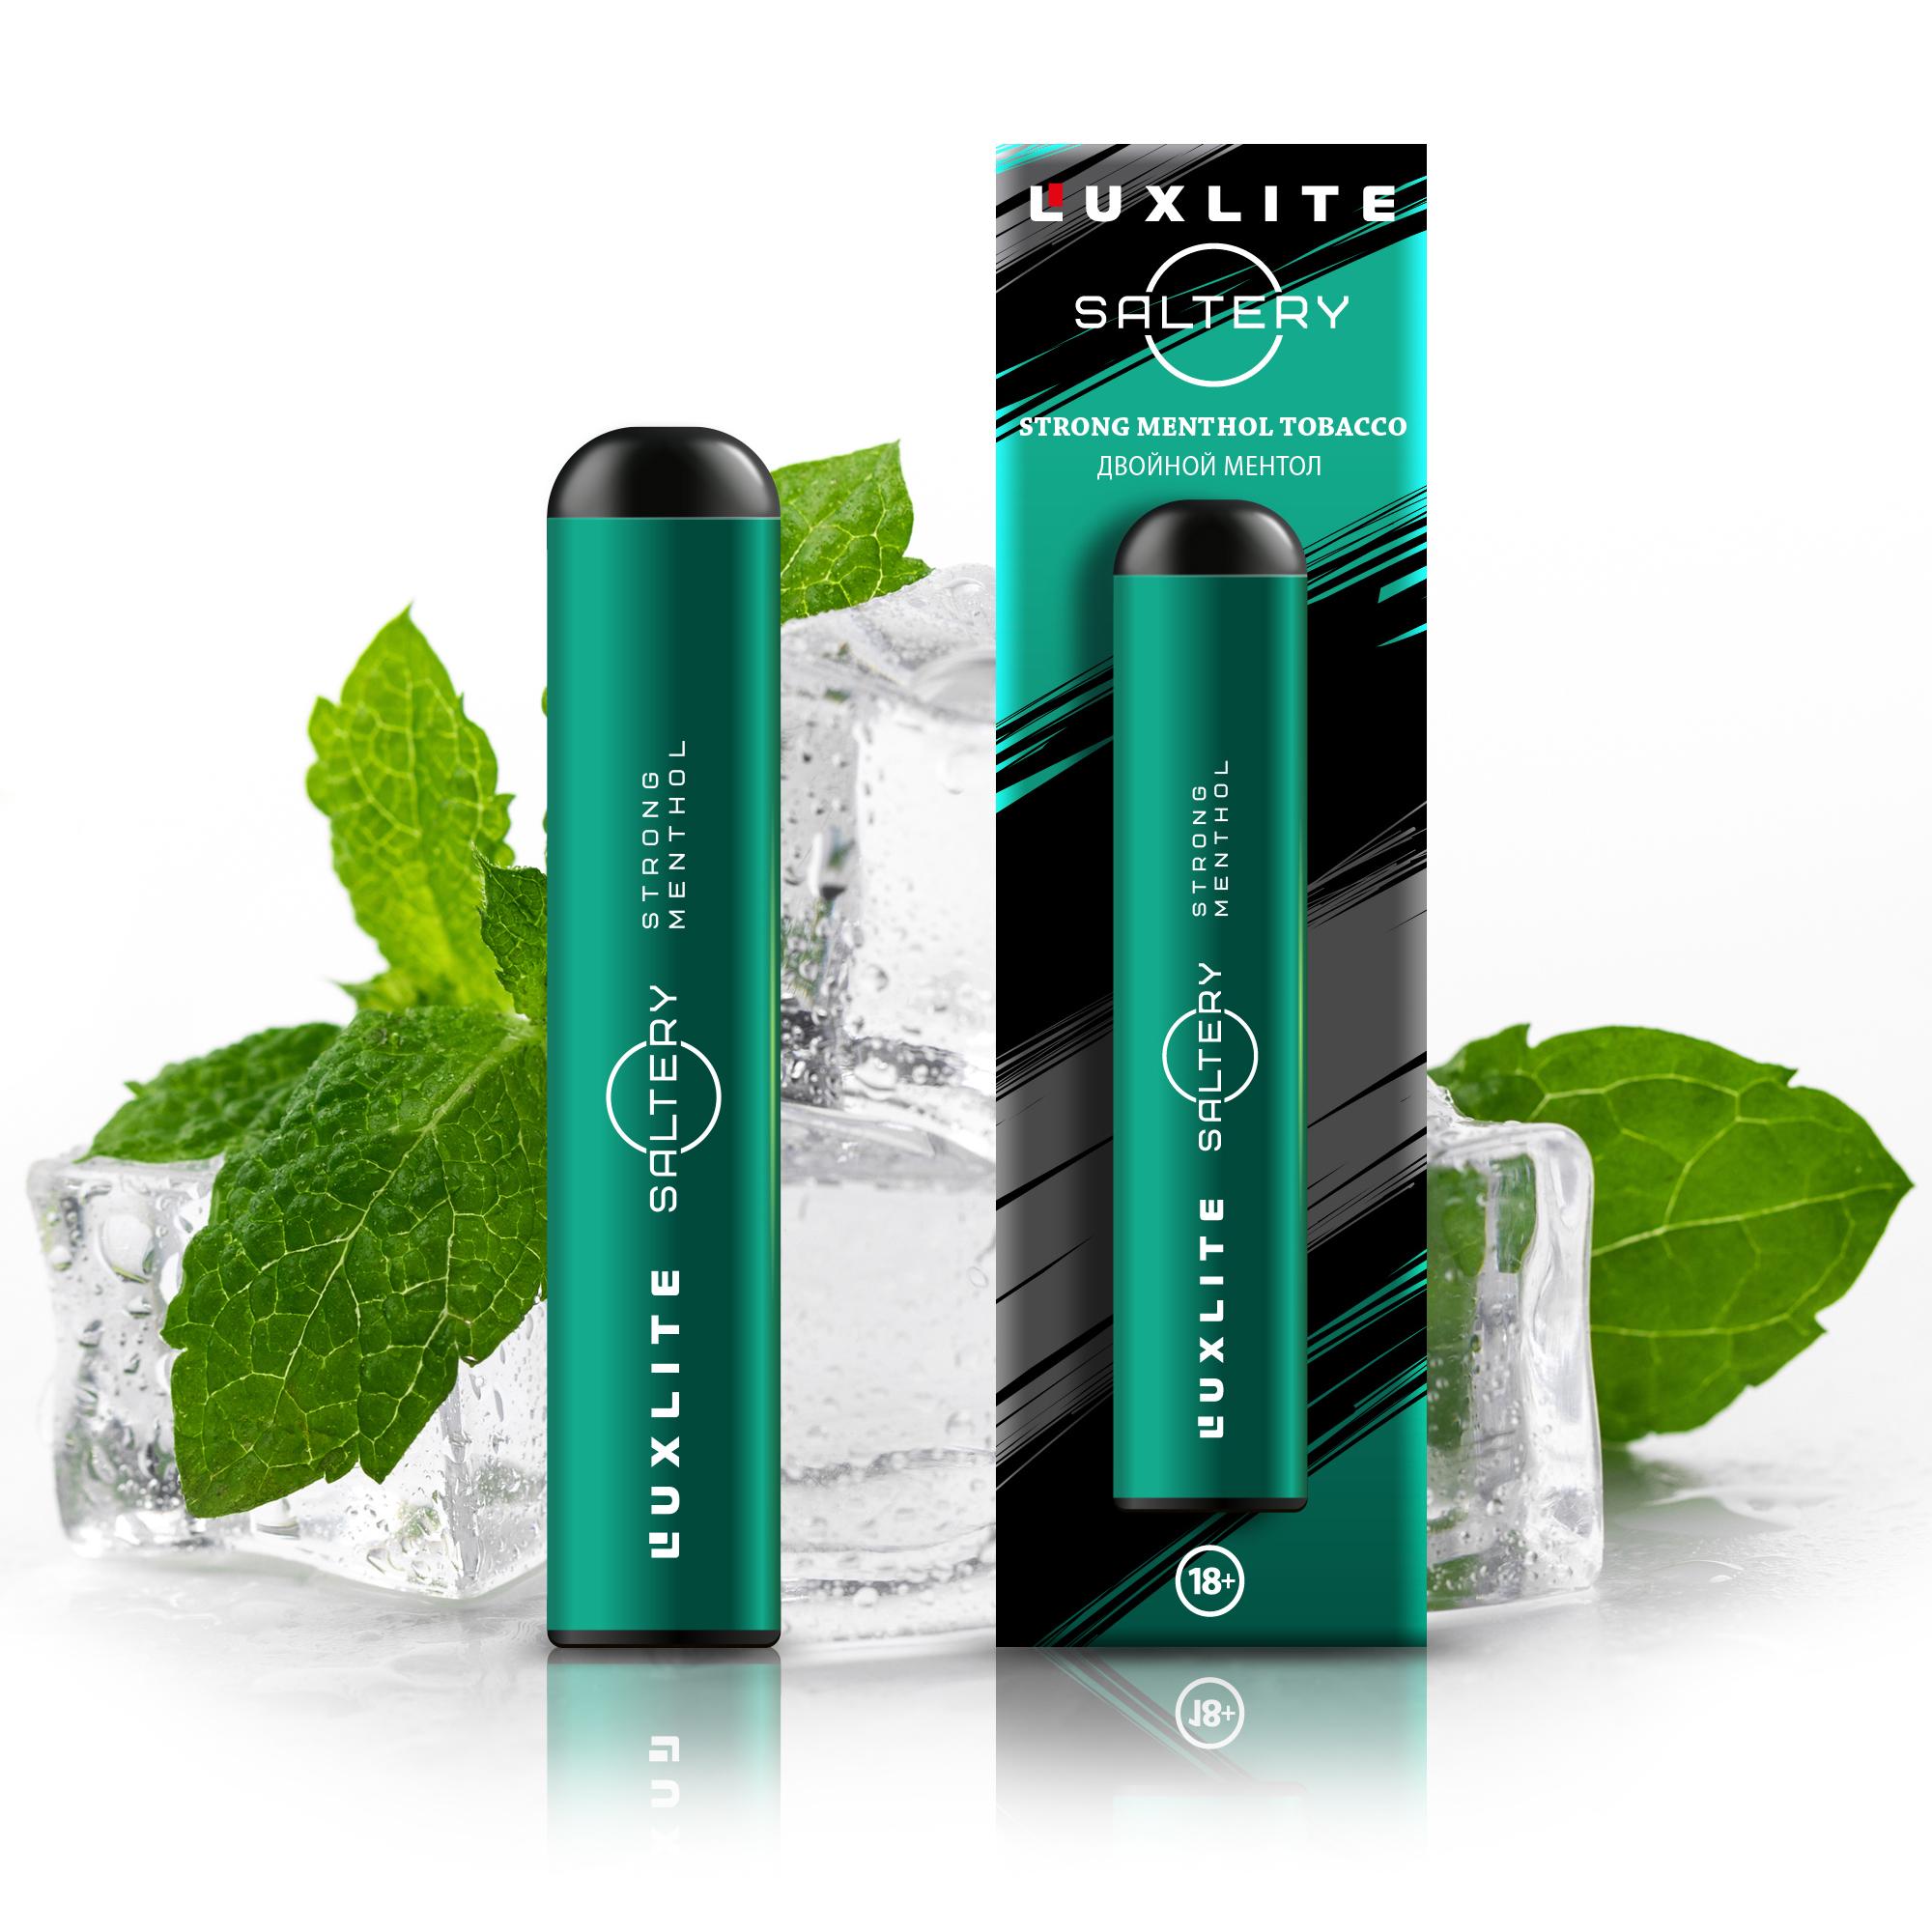 Сигарета Luxlite Saltery электронная со вкусом двойного ментола фото